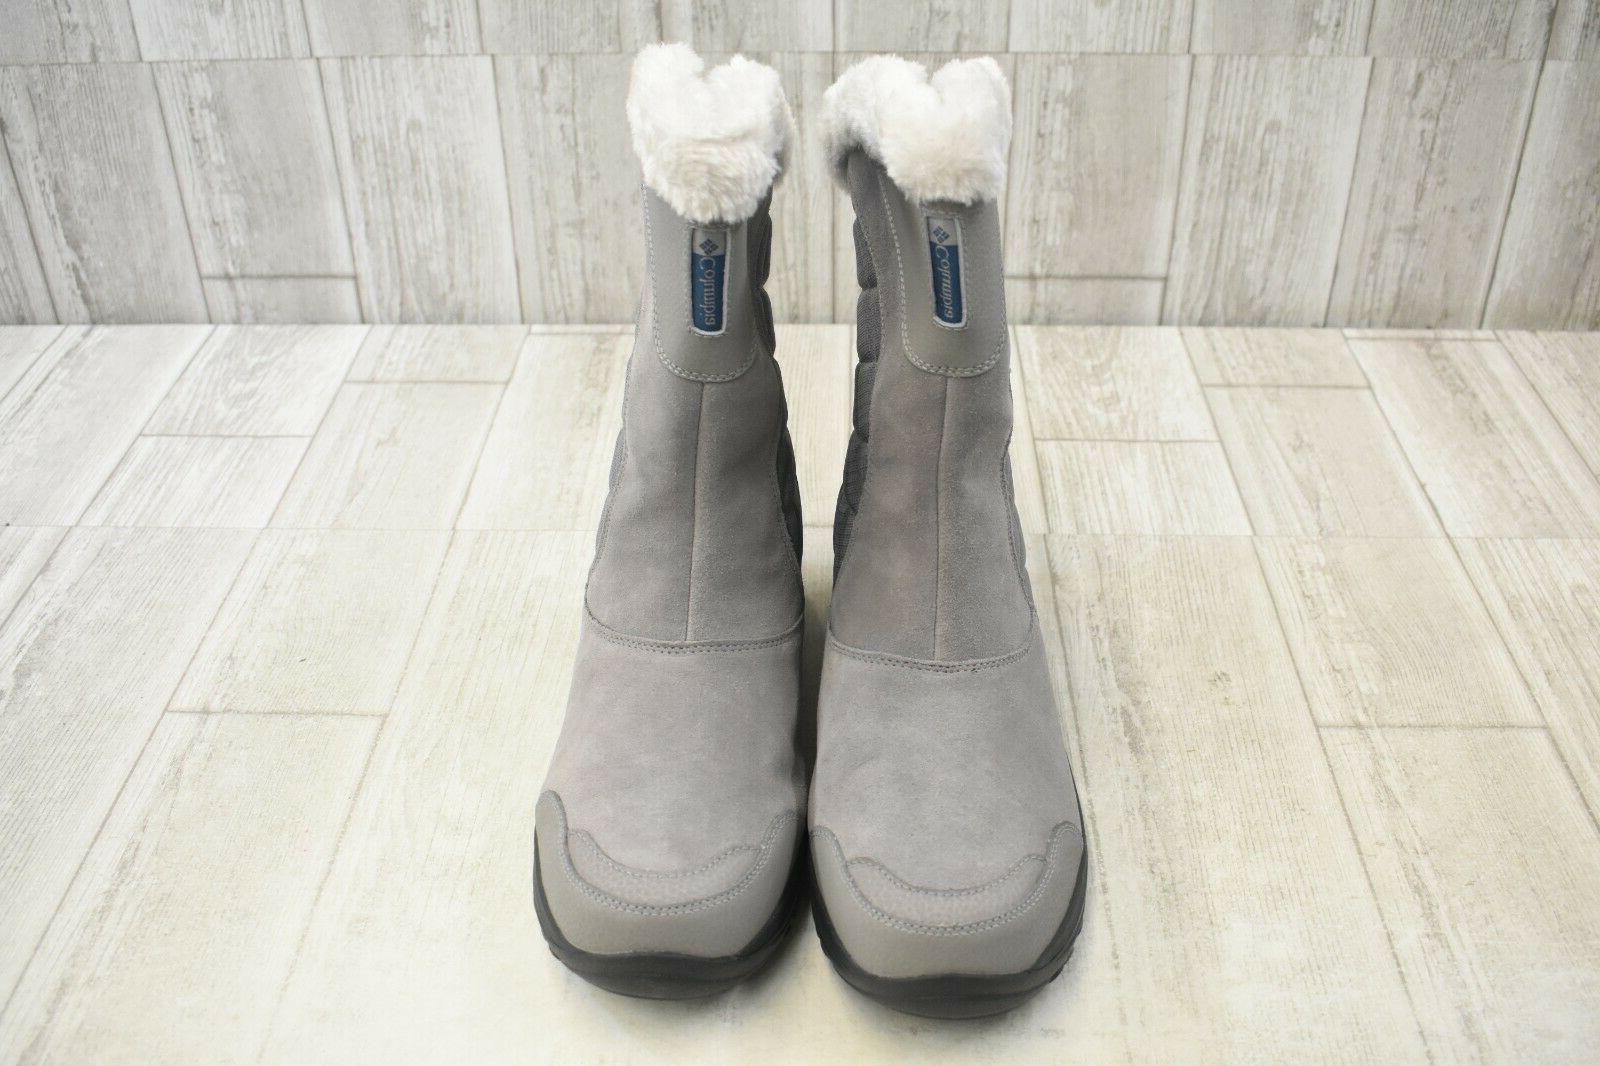 COLUMBIA II Slip WP Boots - 11